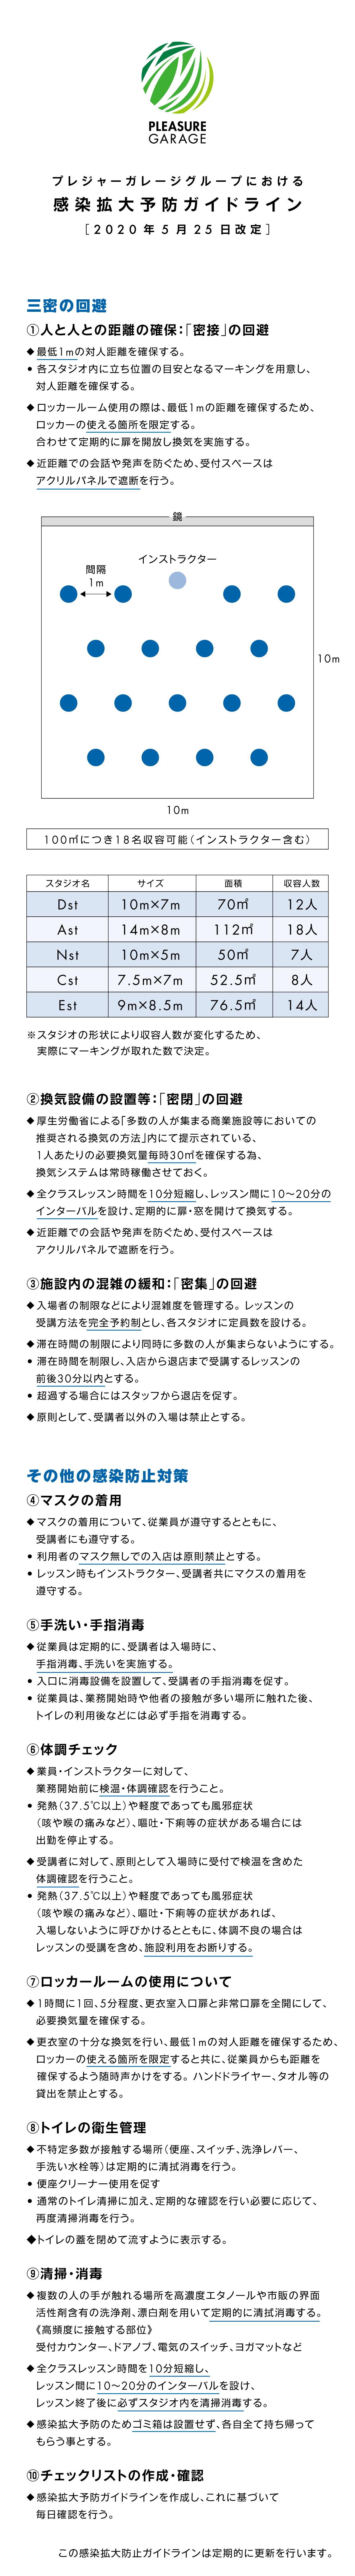 W_Guideline